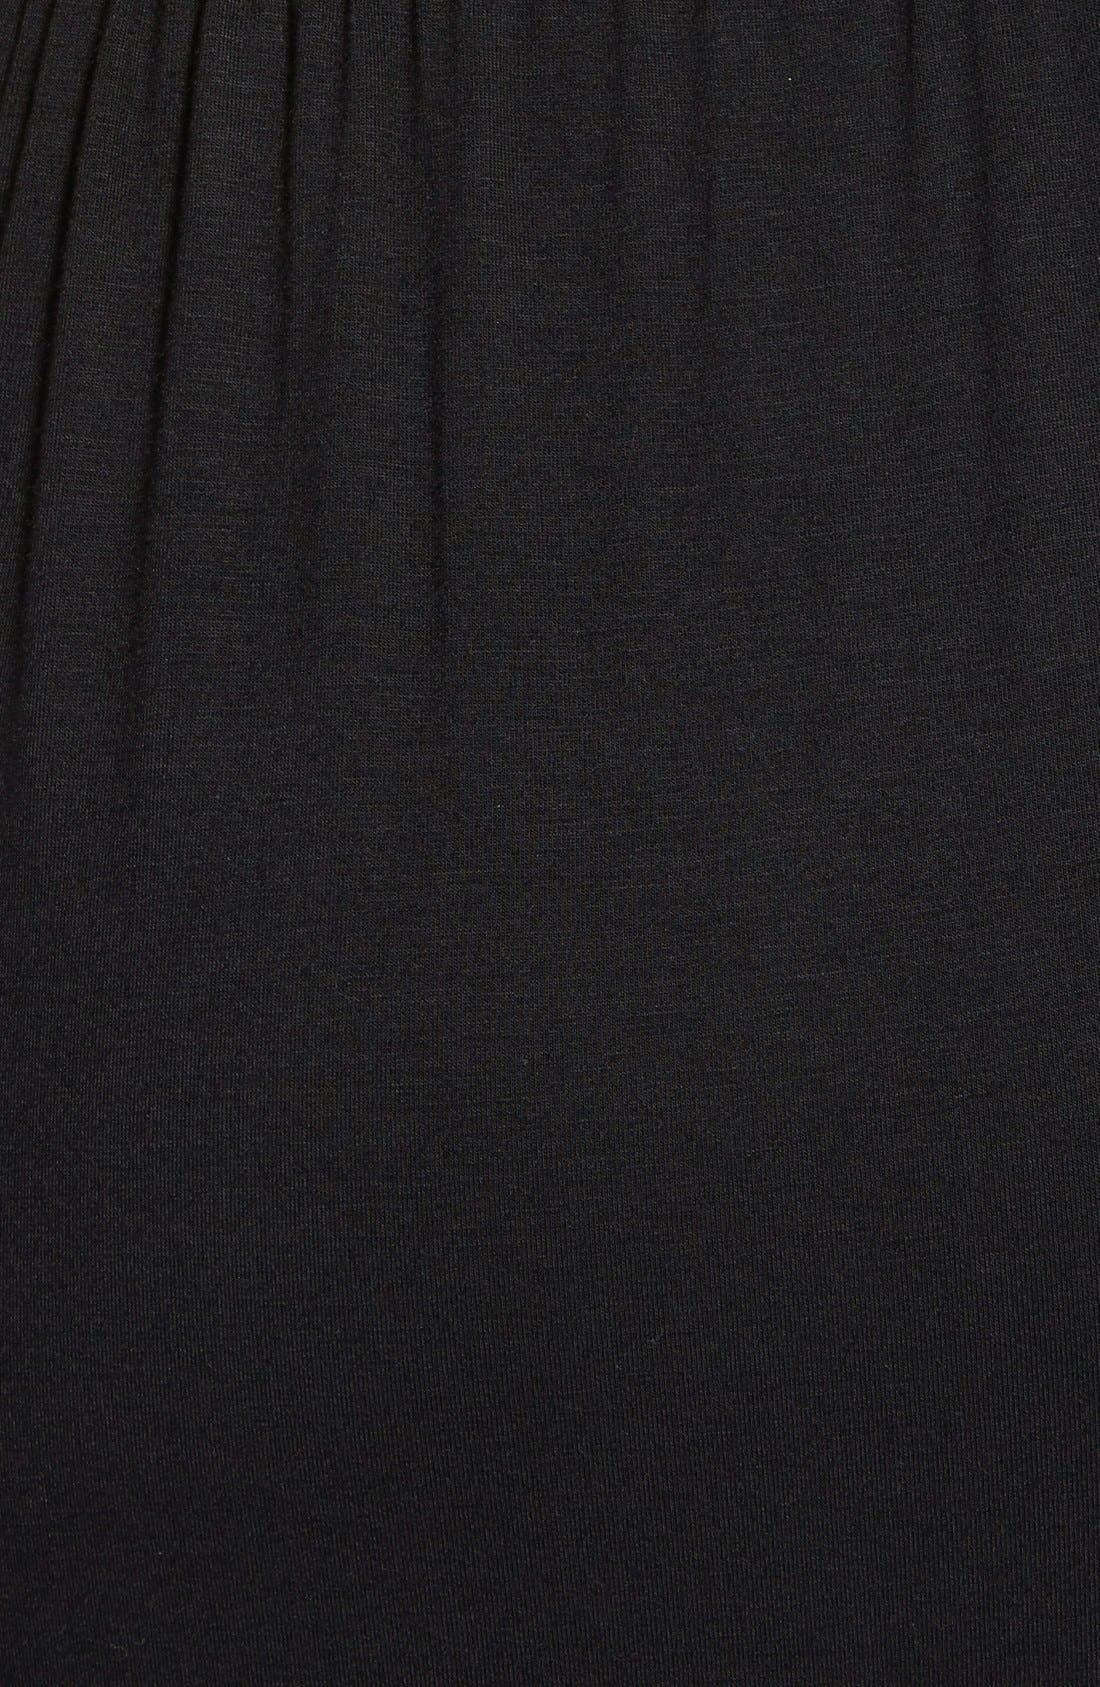 Alternate Image 3  - Loveappella Cap Sleeve Faux Wrap Jersey Maxi Dress (Regular & Petite)